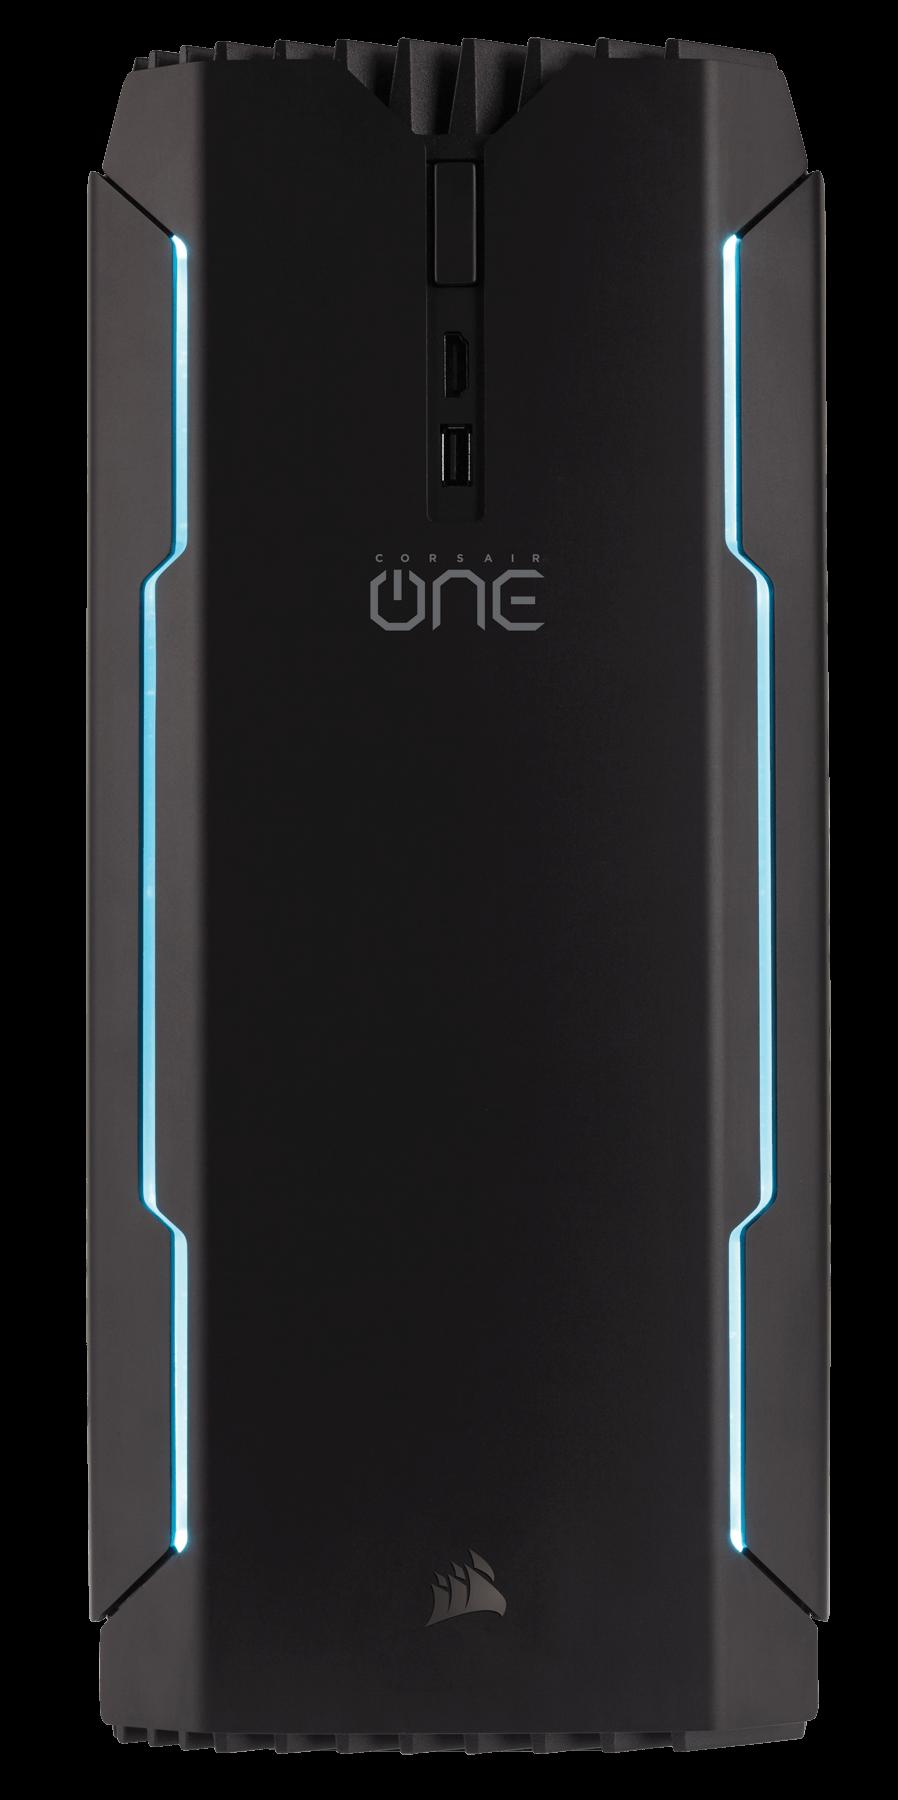 Sistem Brand Corsair One Pro Intel Core i7-7700K GTX 1080 Ti RAM 16GB HDD 2TB + SSD 480GB Windows 10 Home